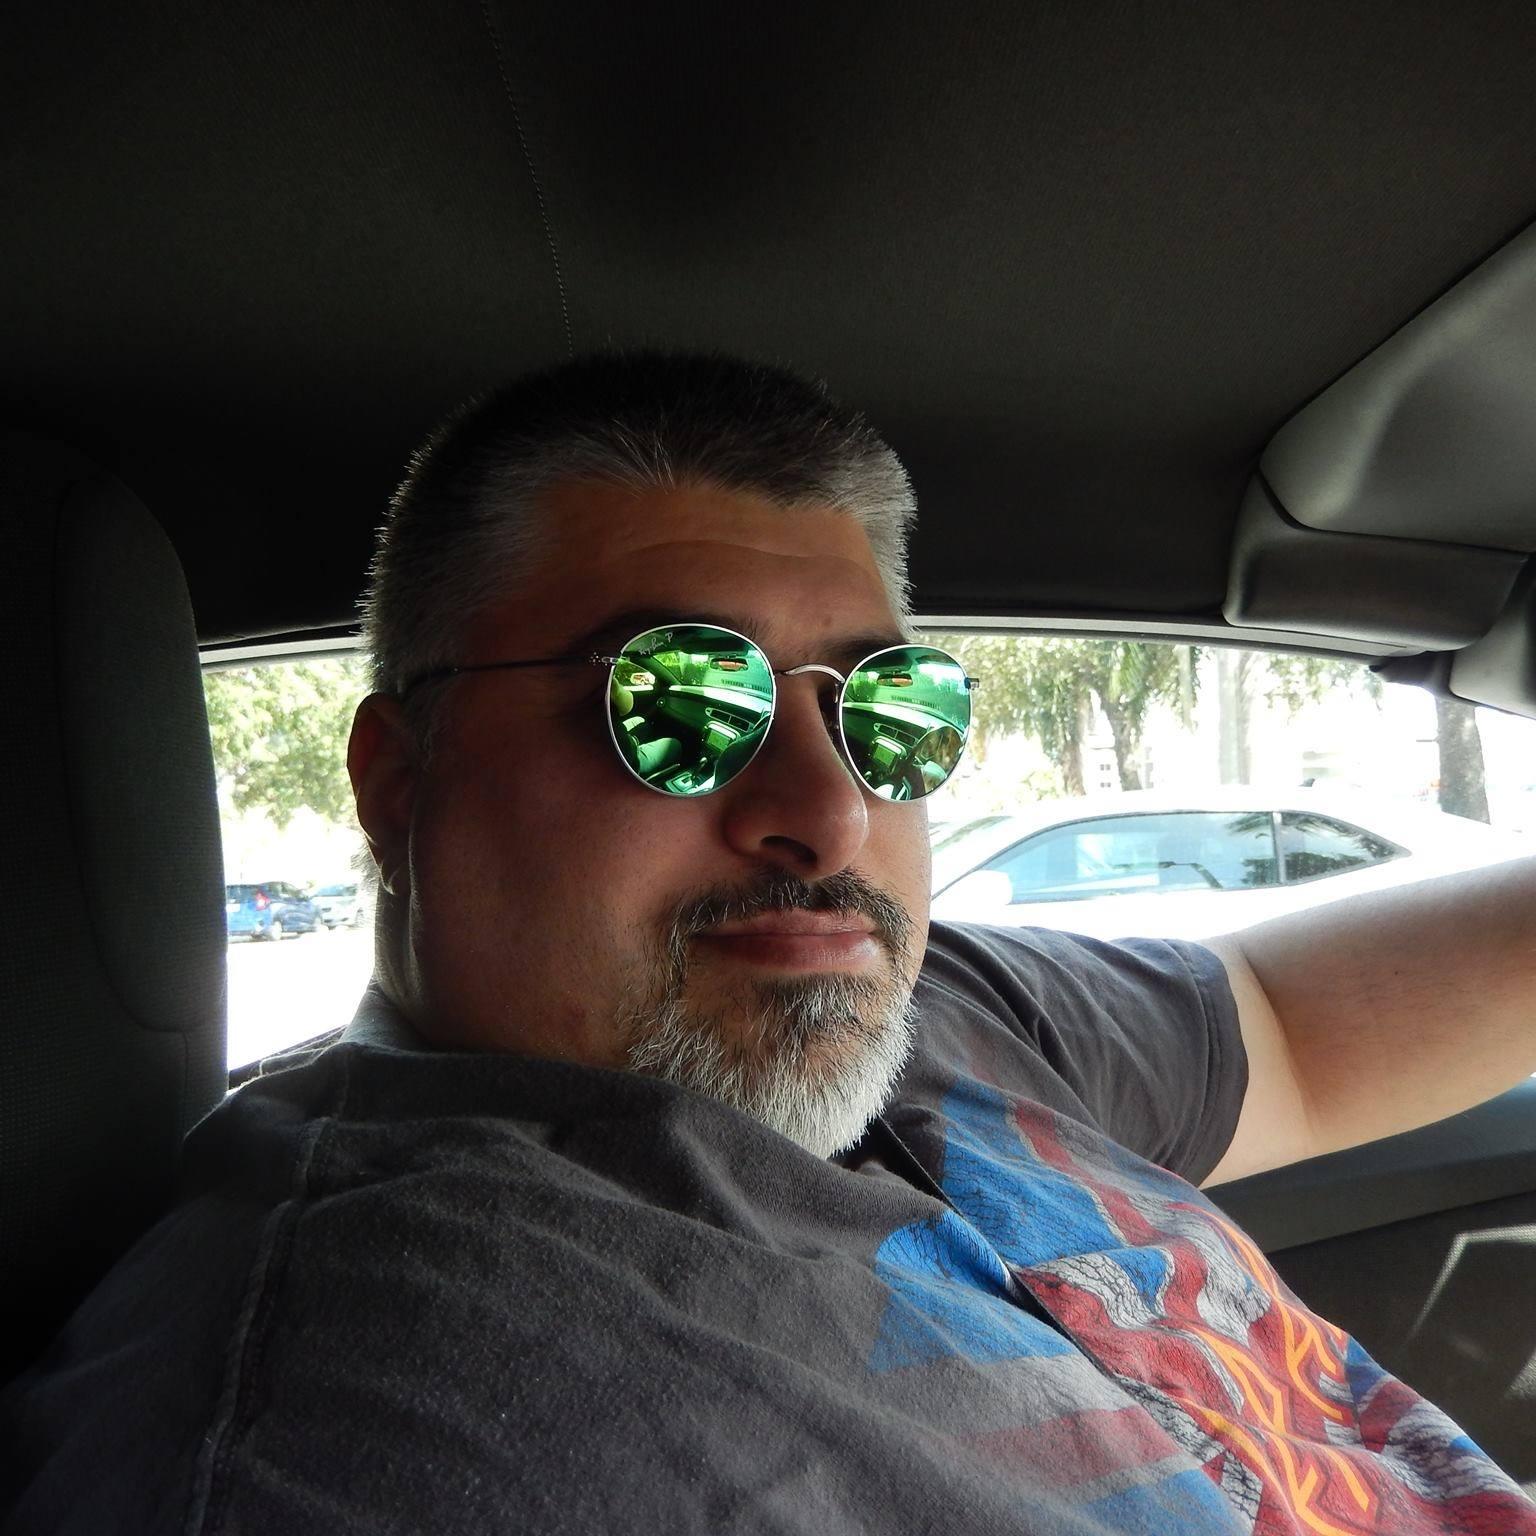 zimmythegreek's avatar